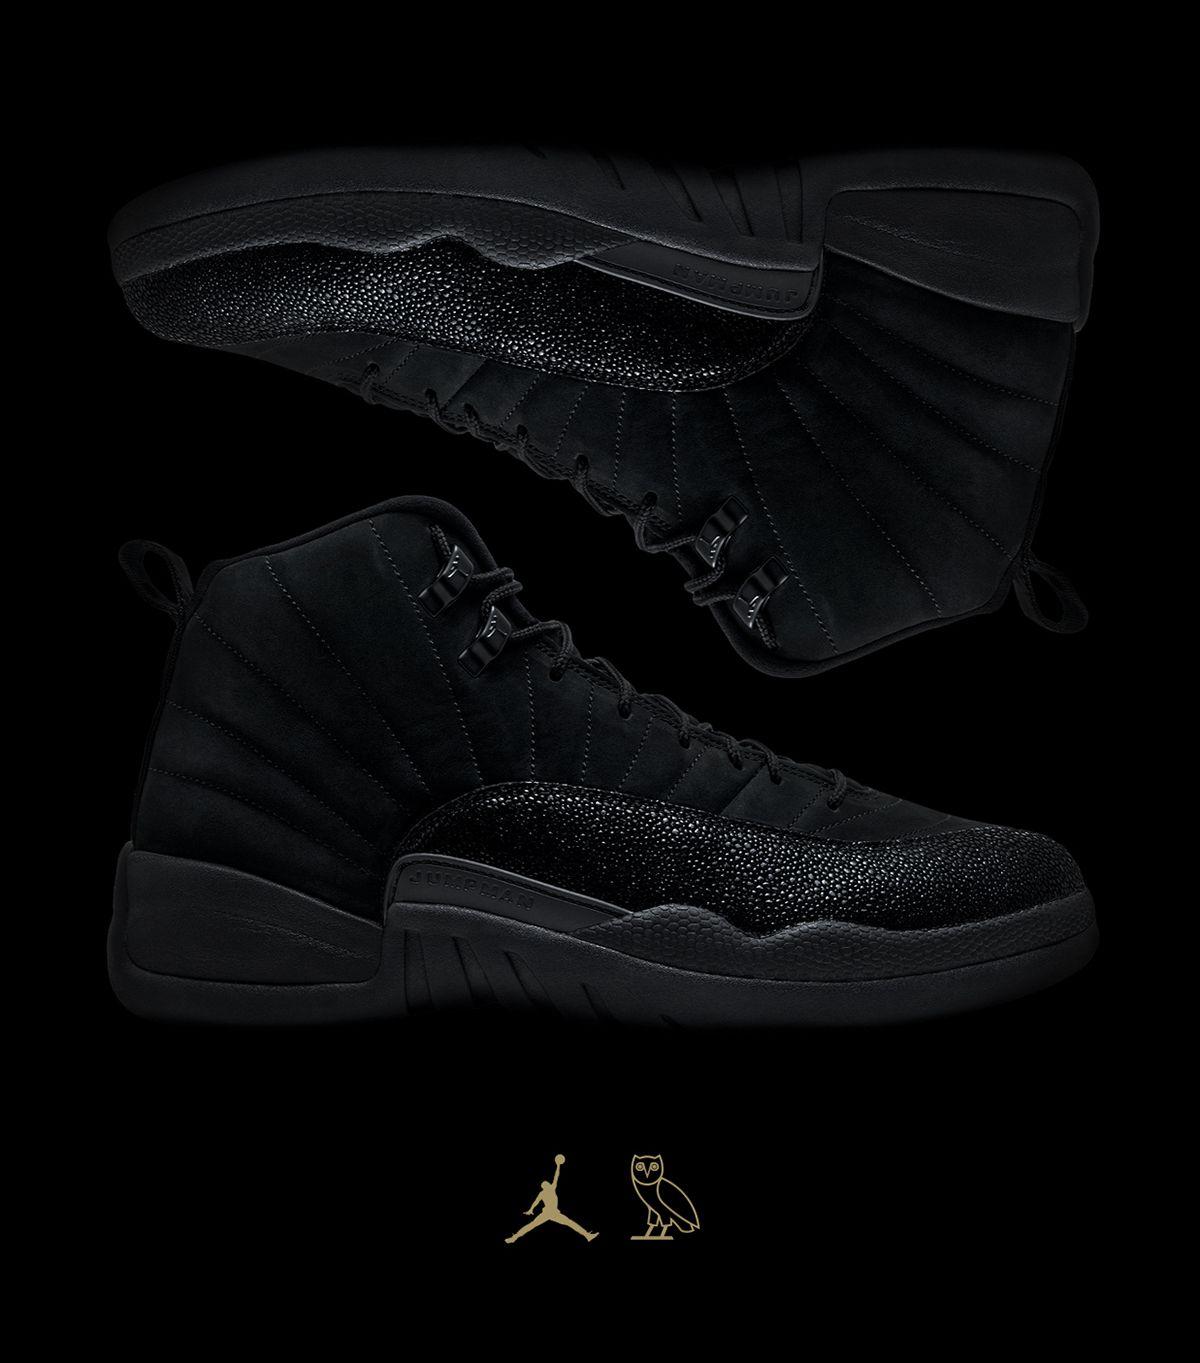 cb8bb65a0d1 Jordan Brand x OVO  2017 NBA All-Star Collection - EU Kicks  Sneaker ...